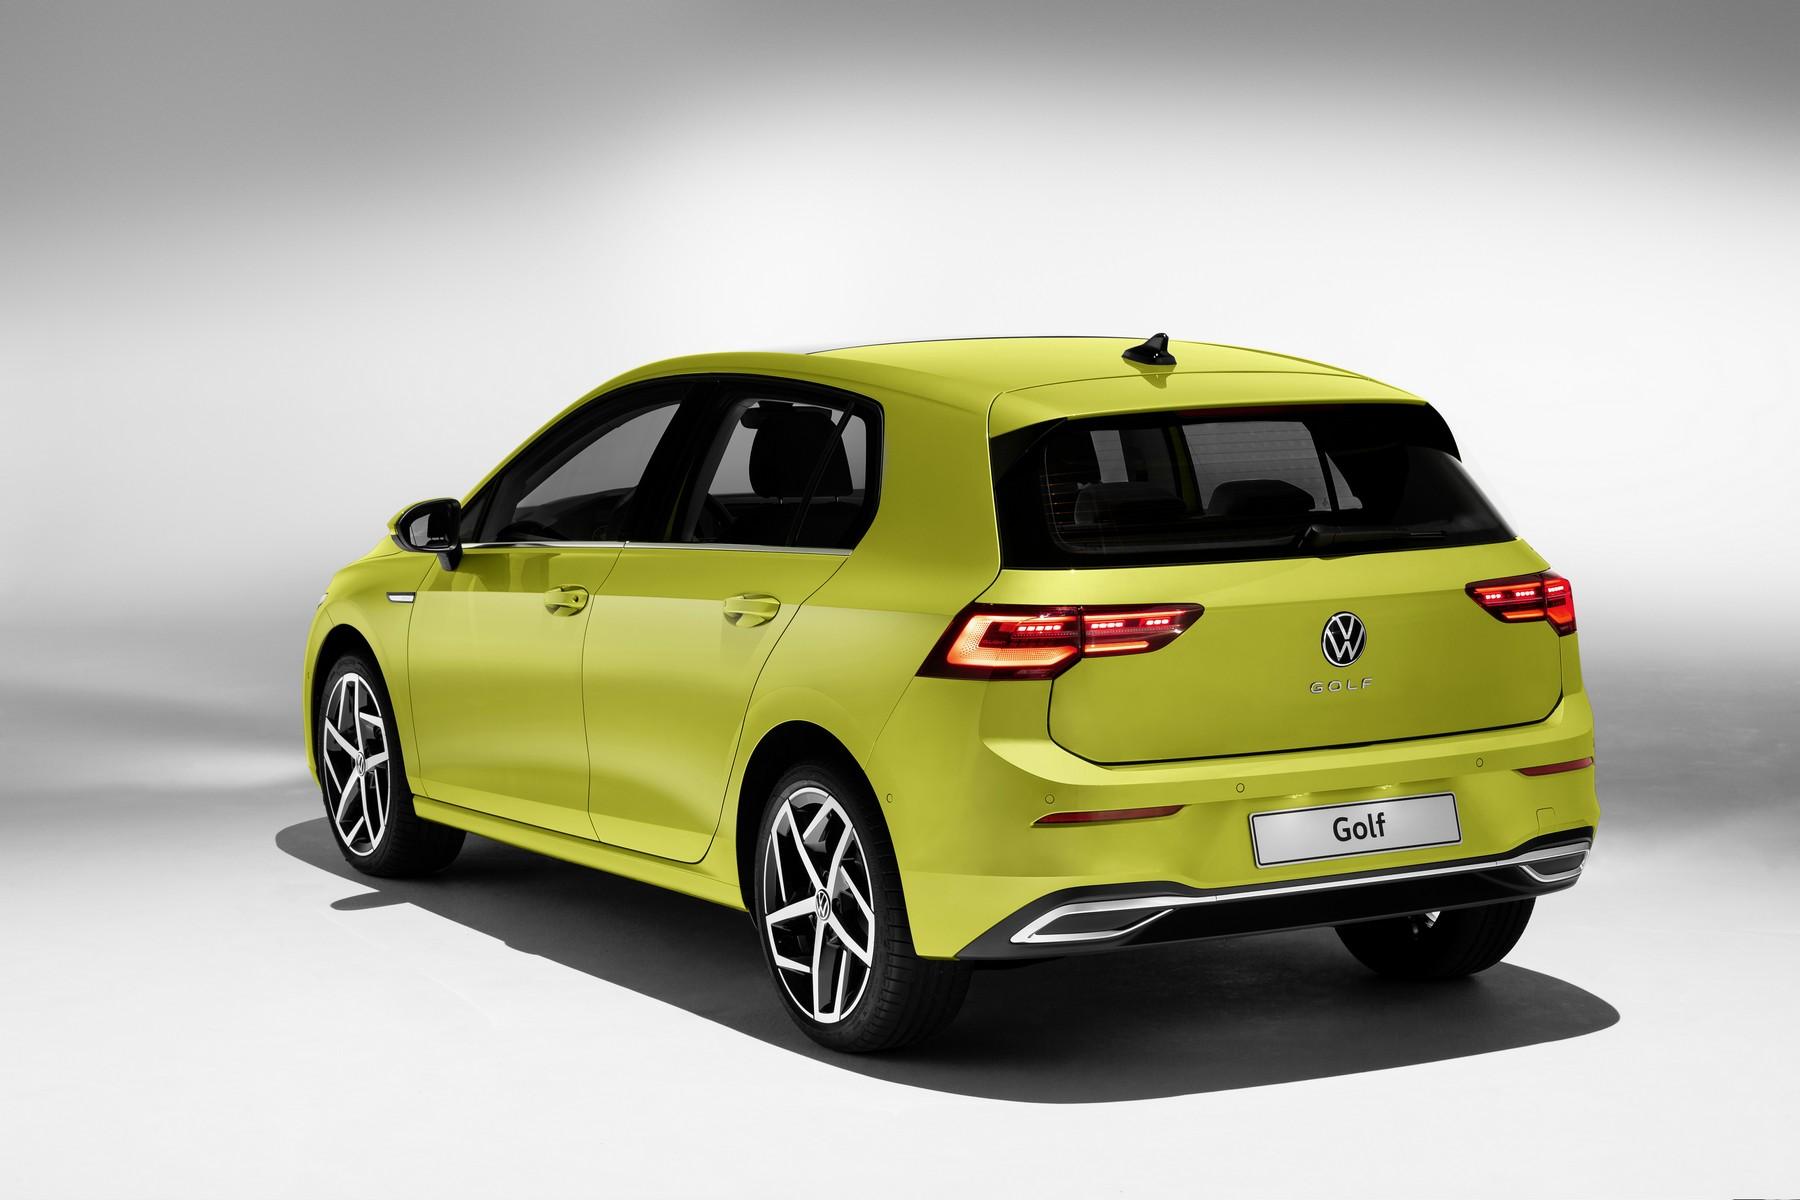 VW-Golf-8-1